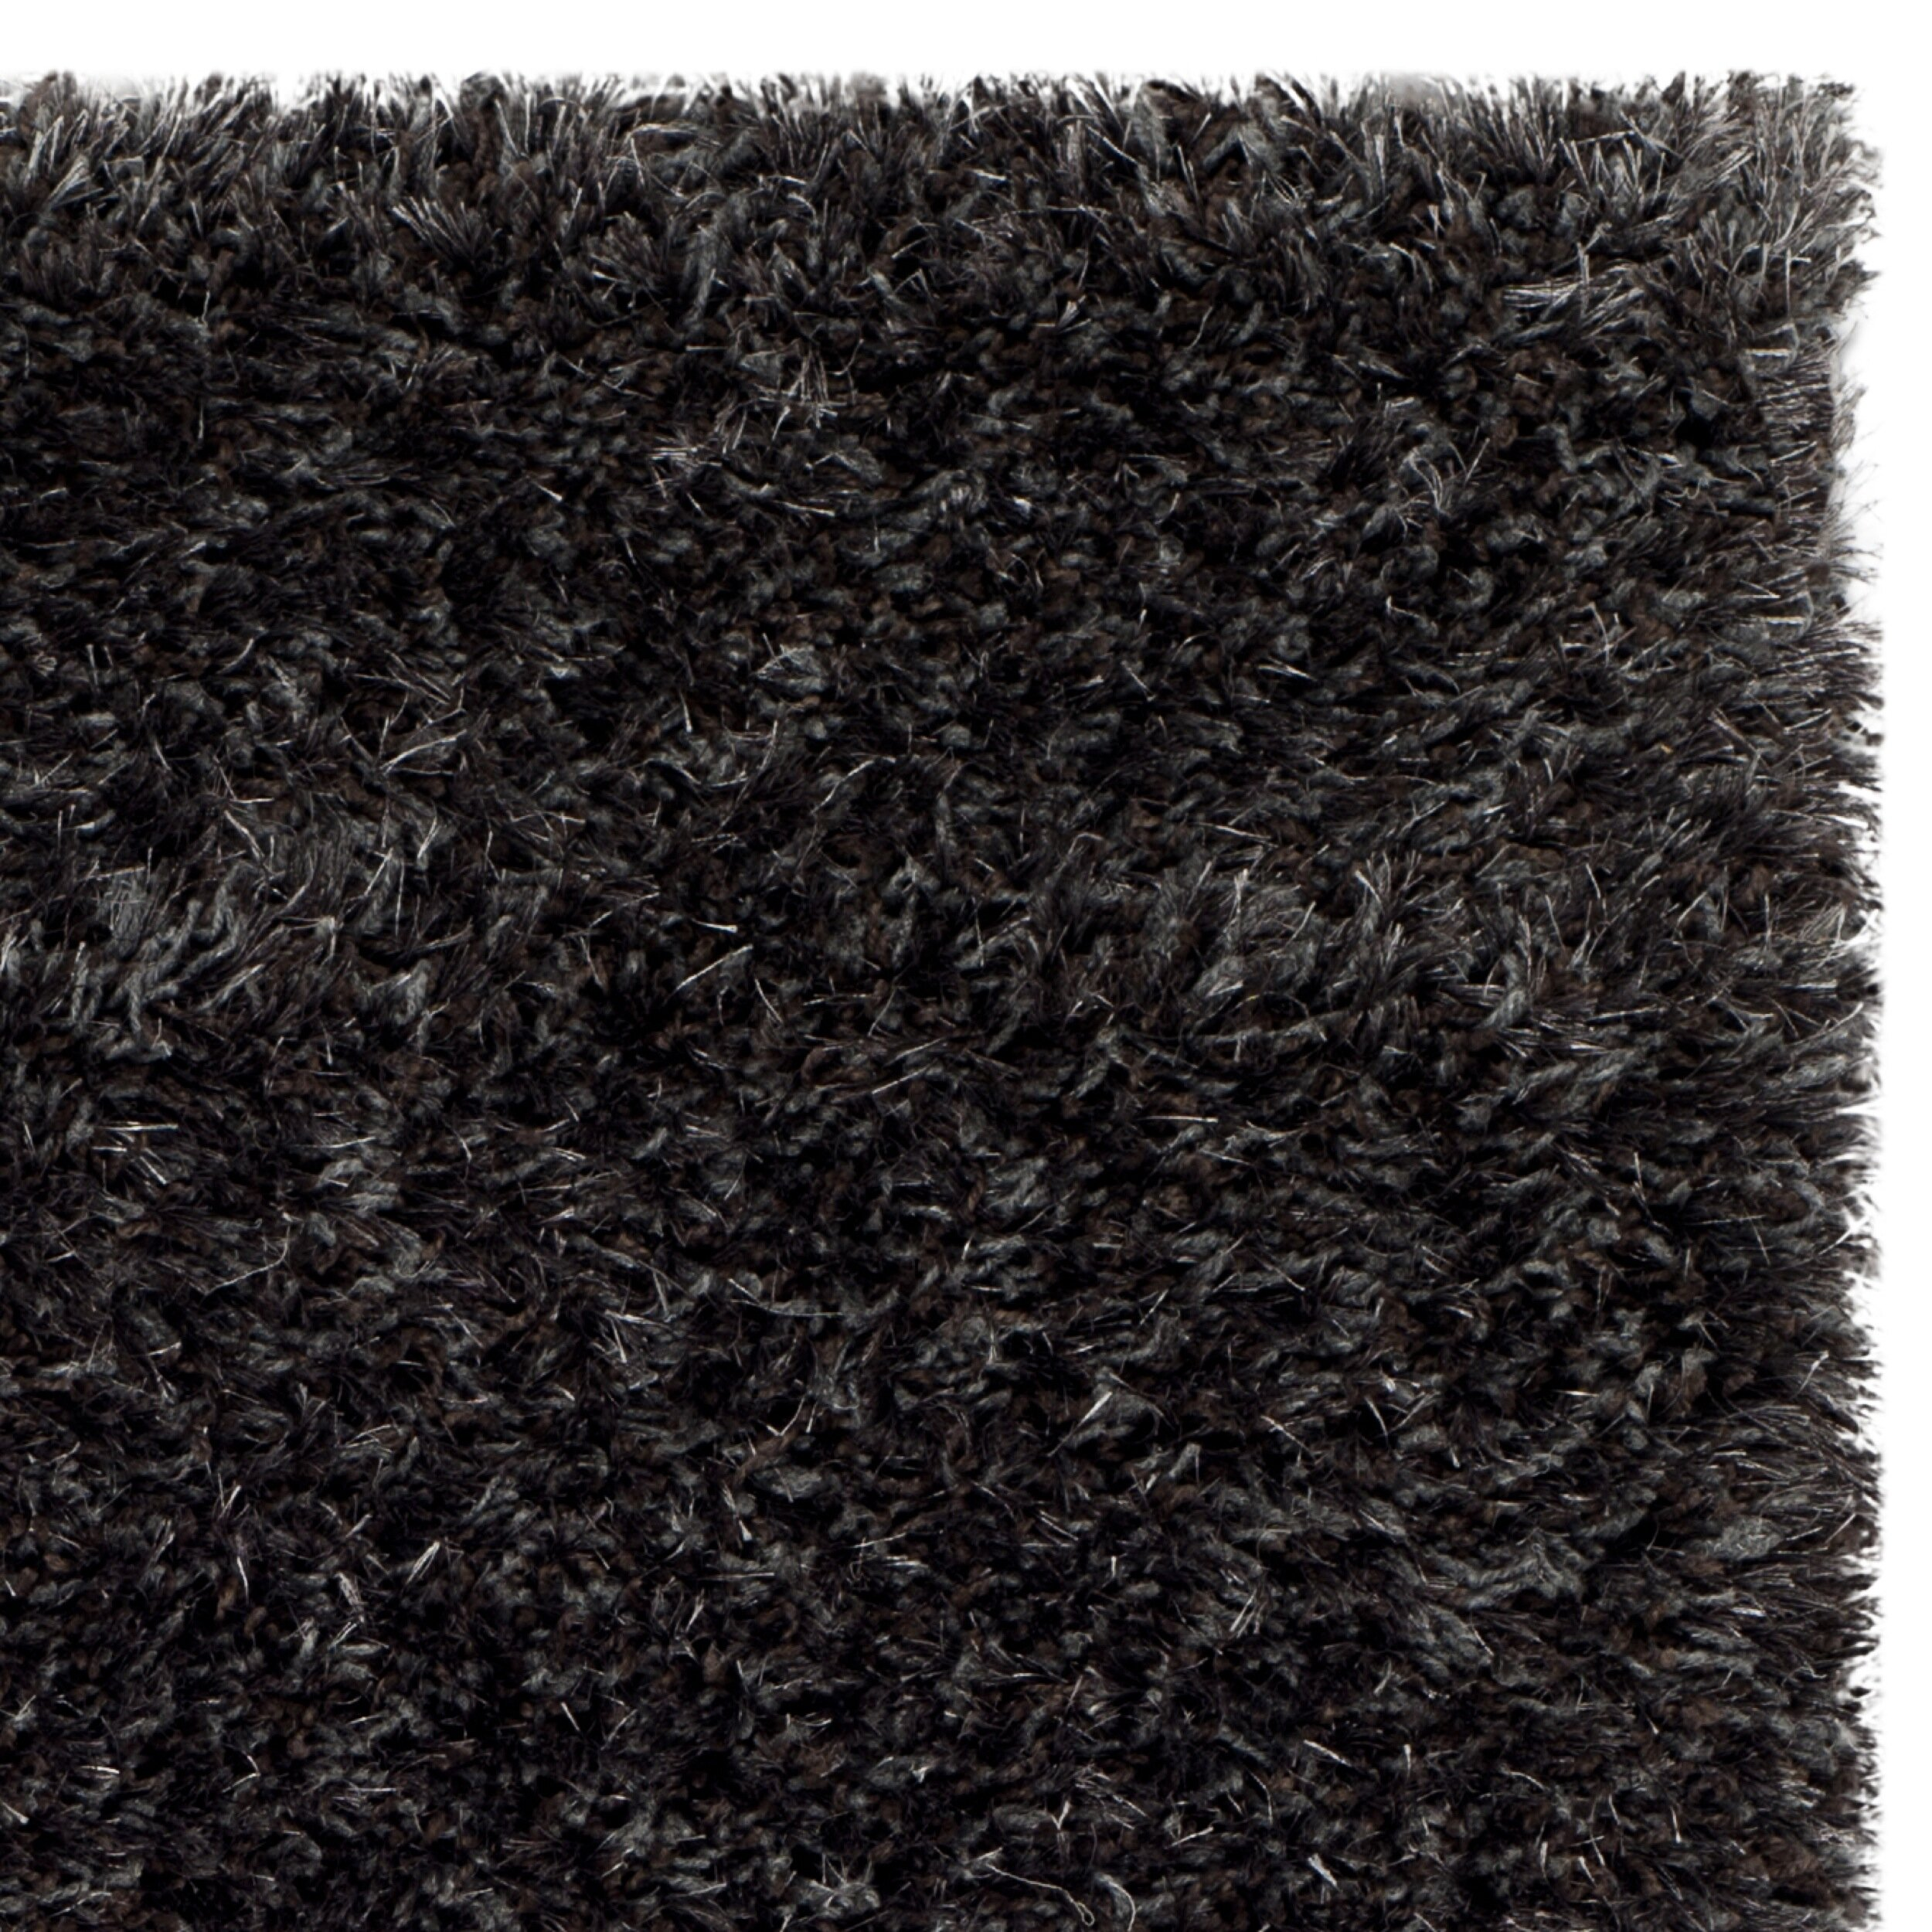 Safavieh Rhapsody Charcoal Grey Shag Rug Reviews Wayfair